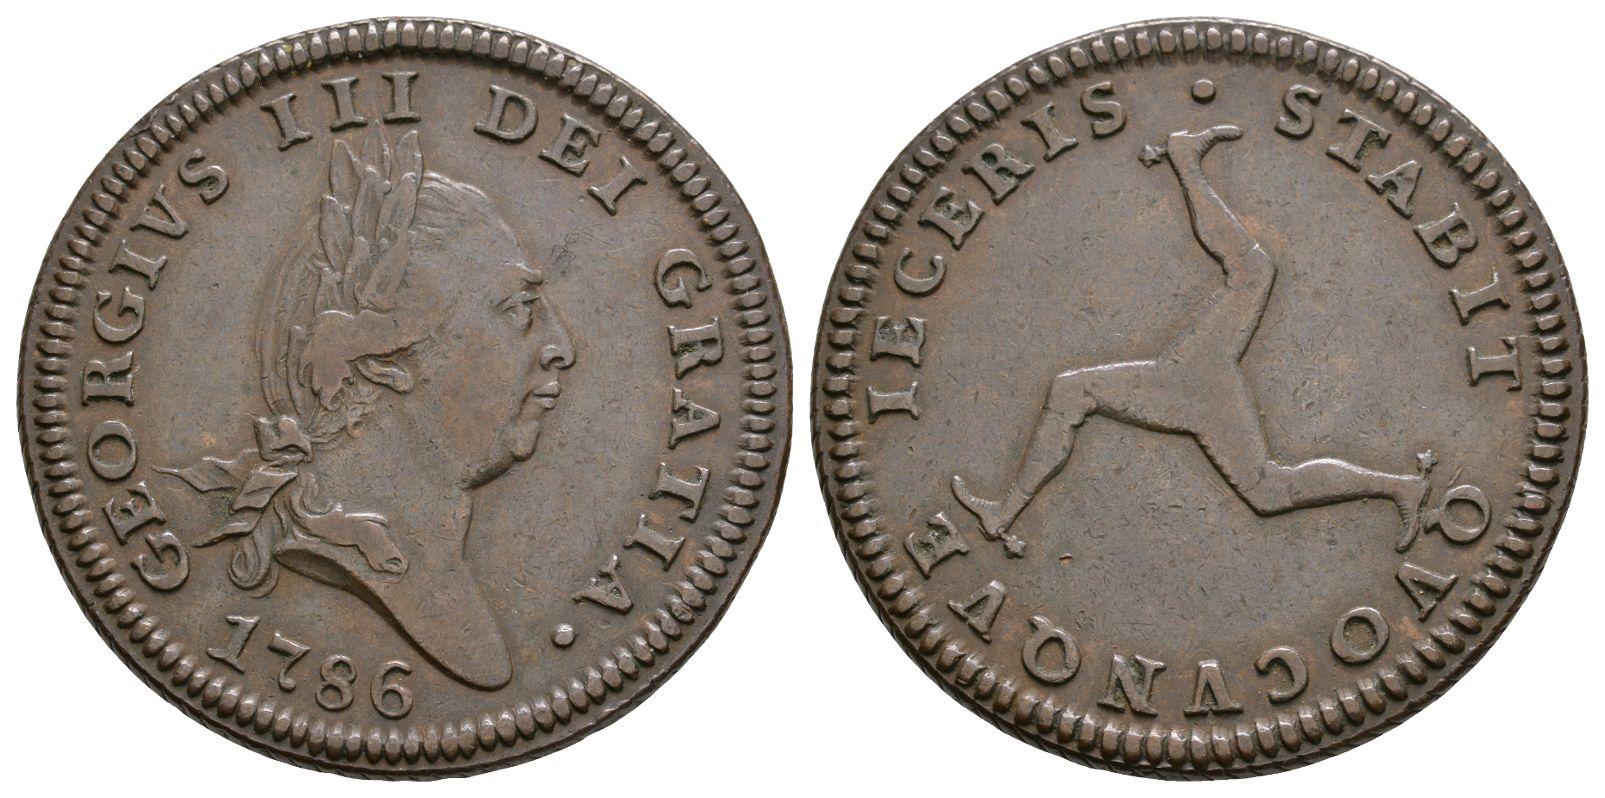 World Coins - Isle of Man - George III - 1786 - Penny